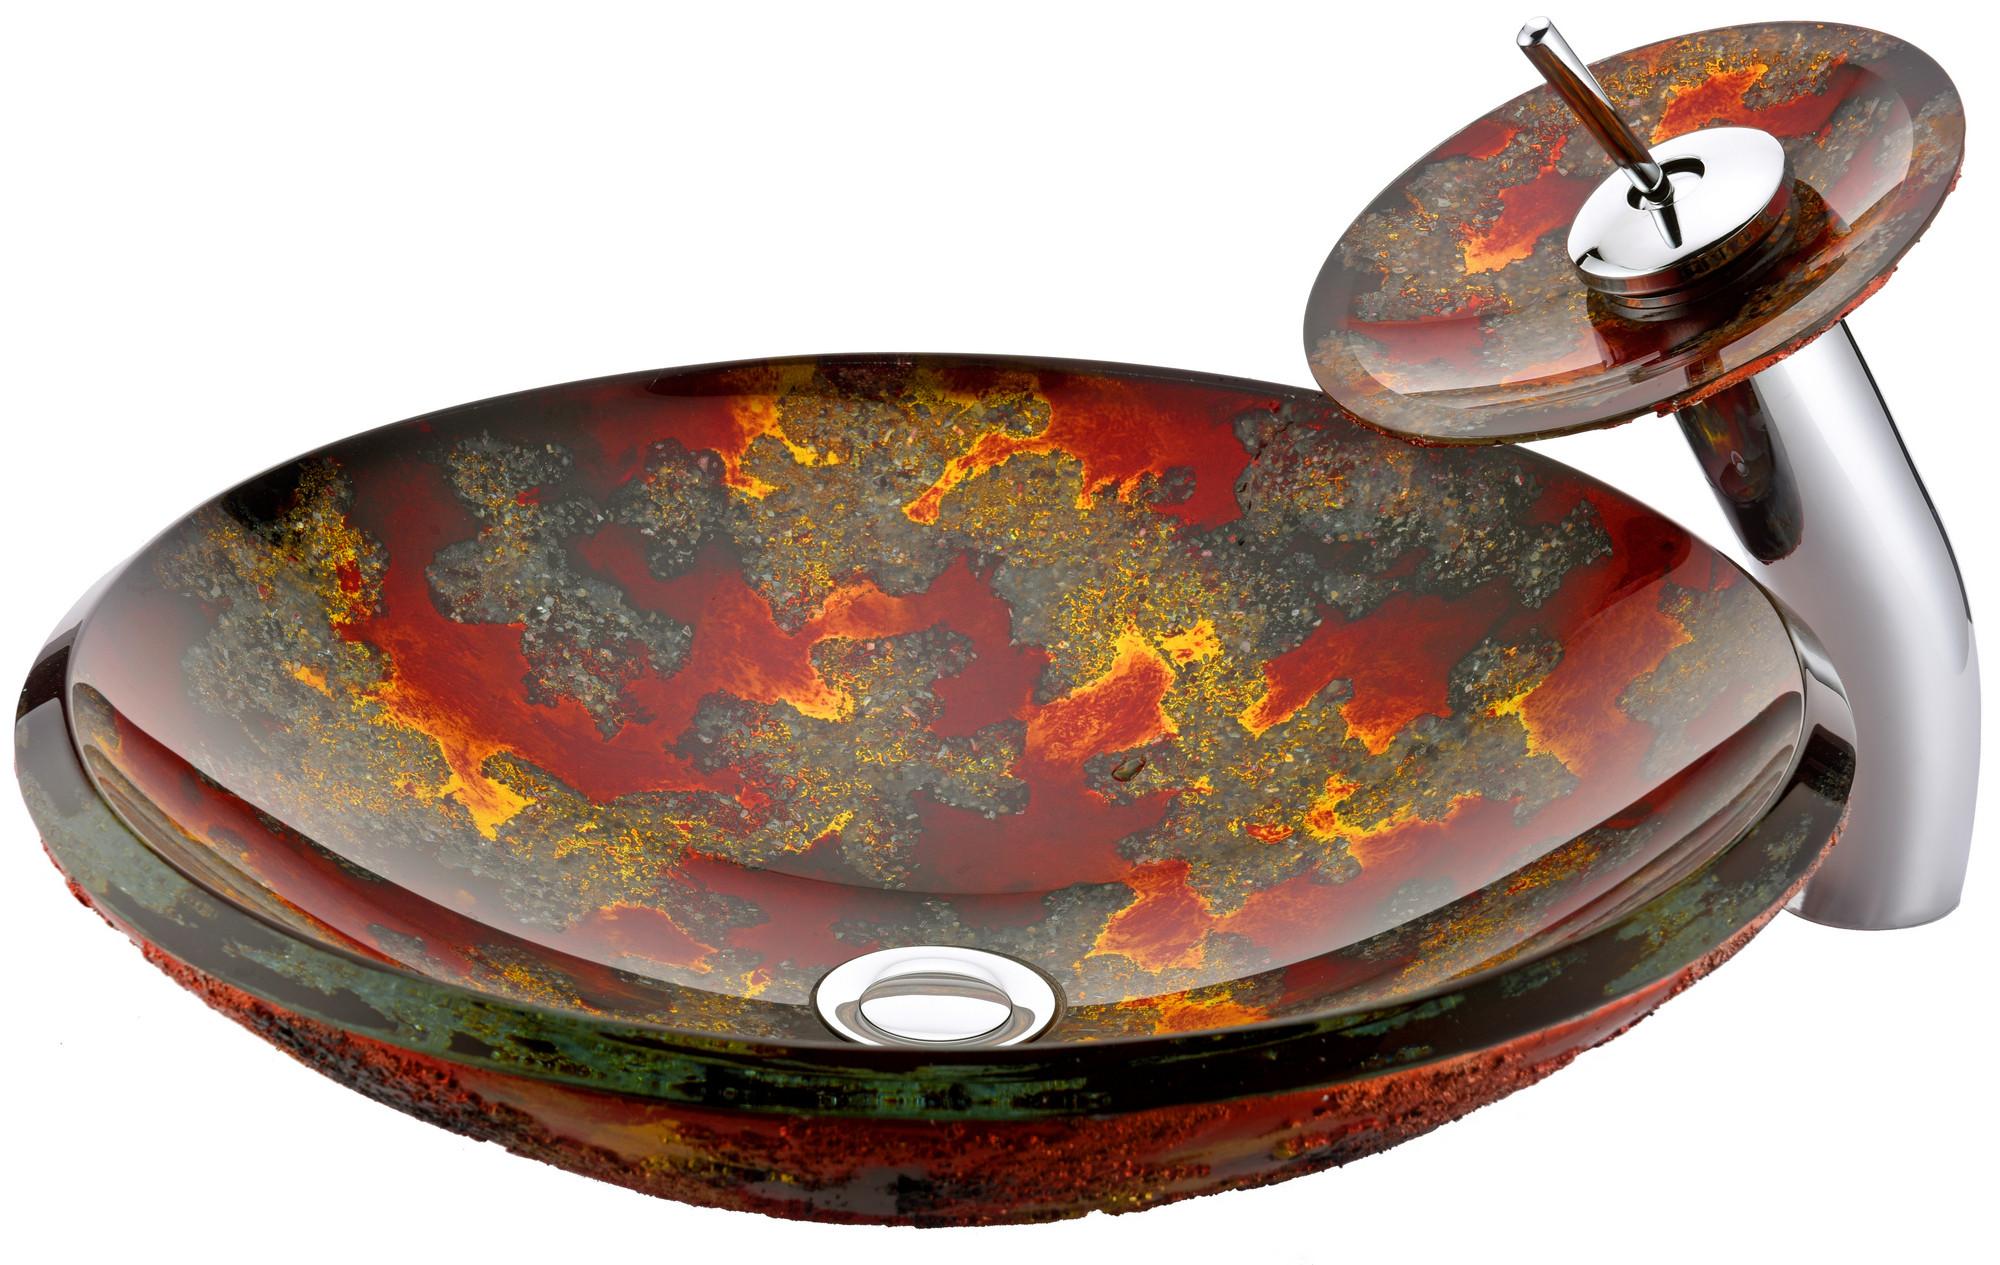 ANZZI LS-AZ219 Chrona Series Deco-Glass Vessel Sink In Hardened Magma